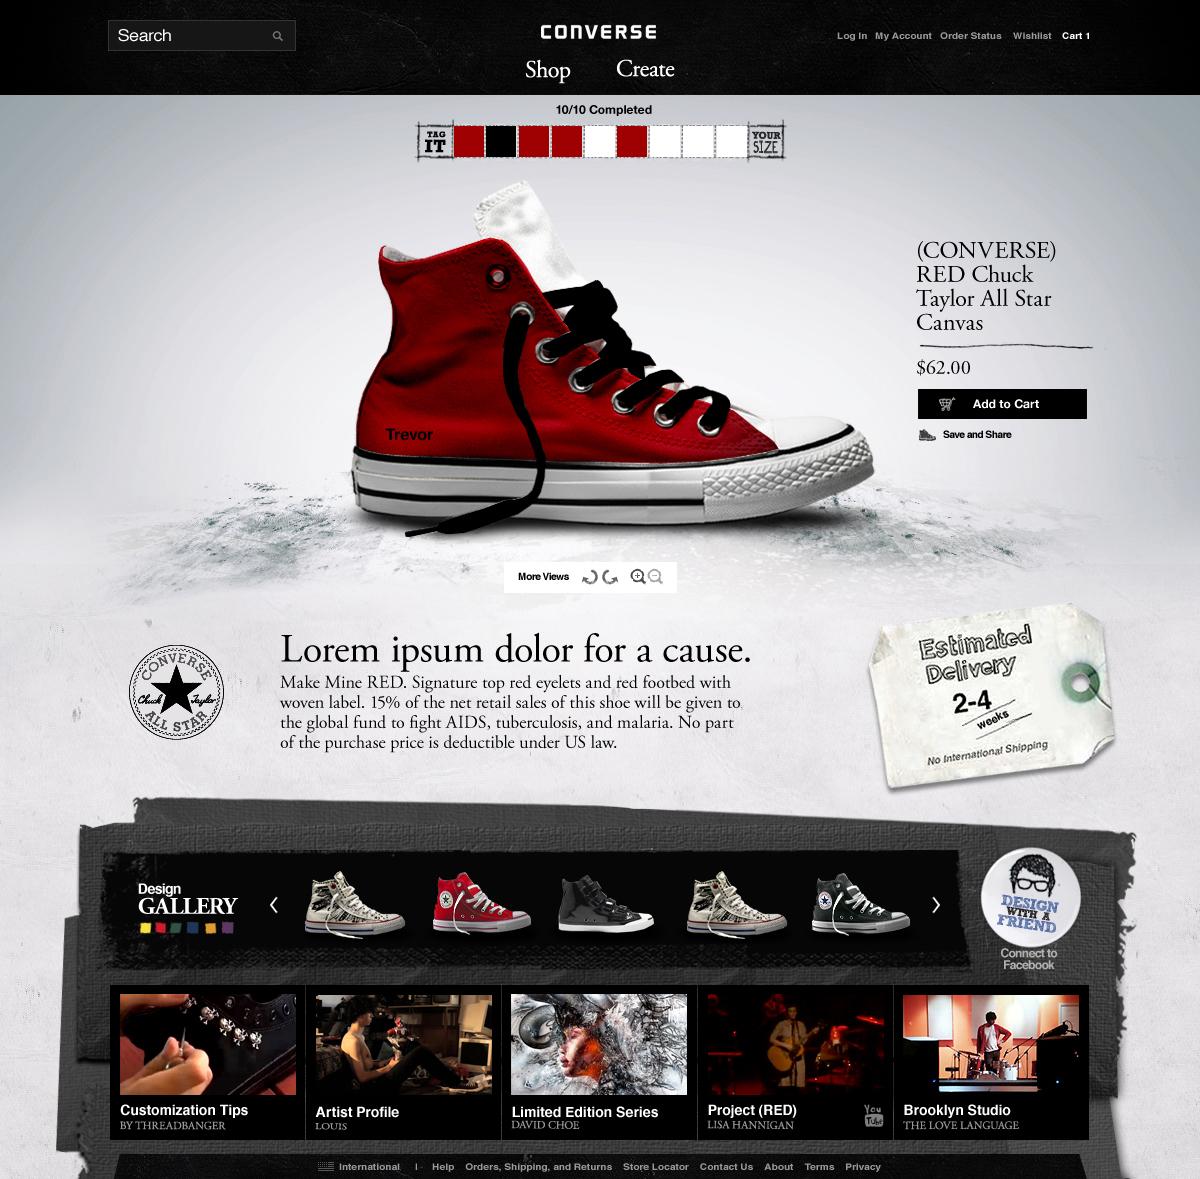 Converse Screenshot #4